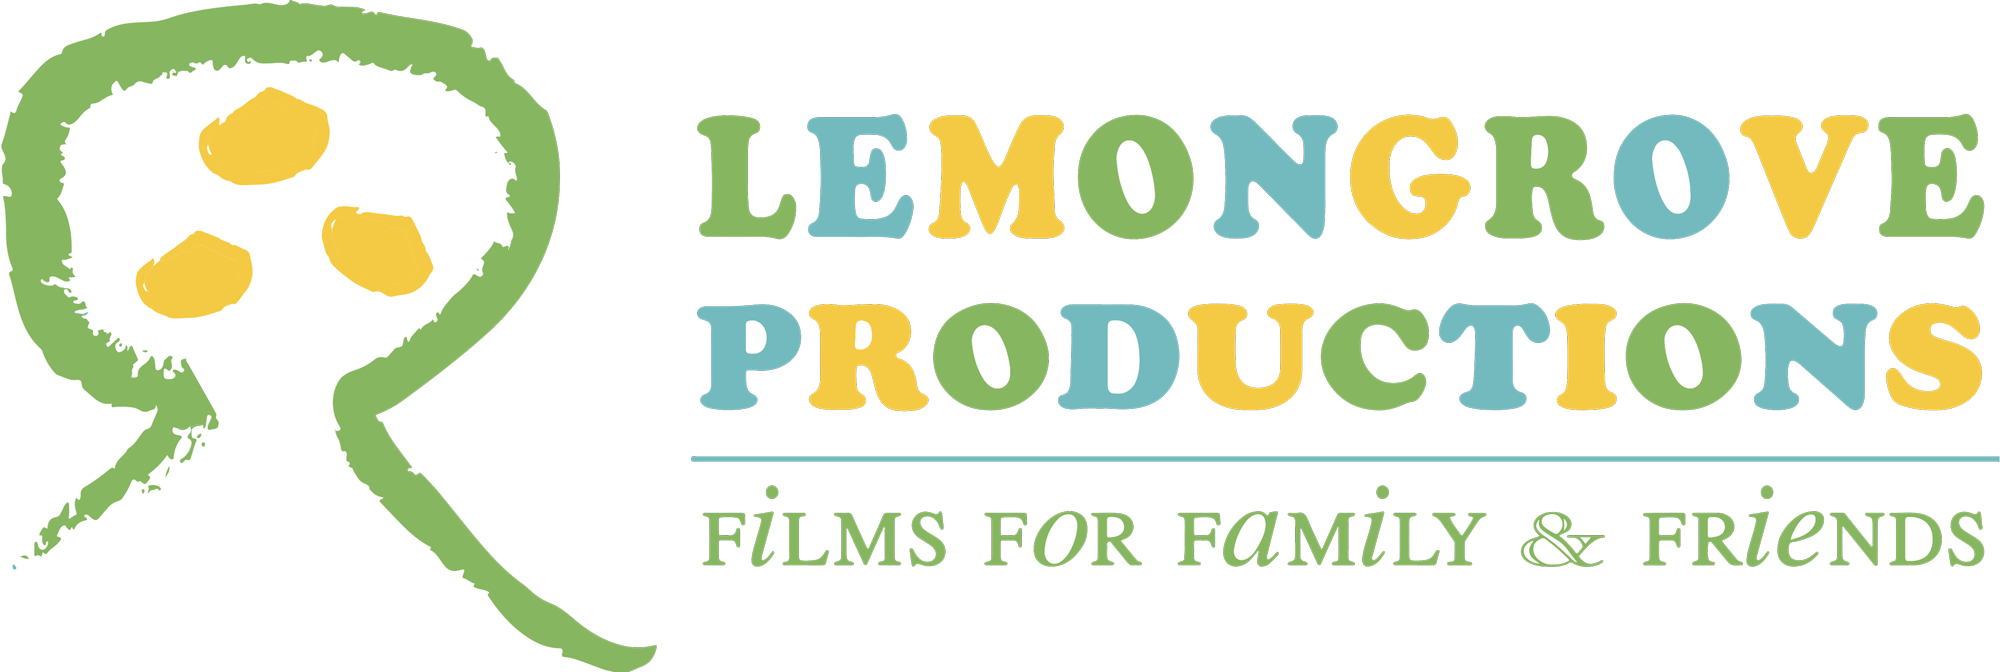 Lemongrove Productions